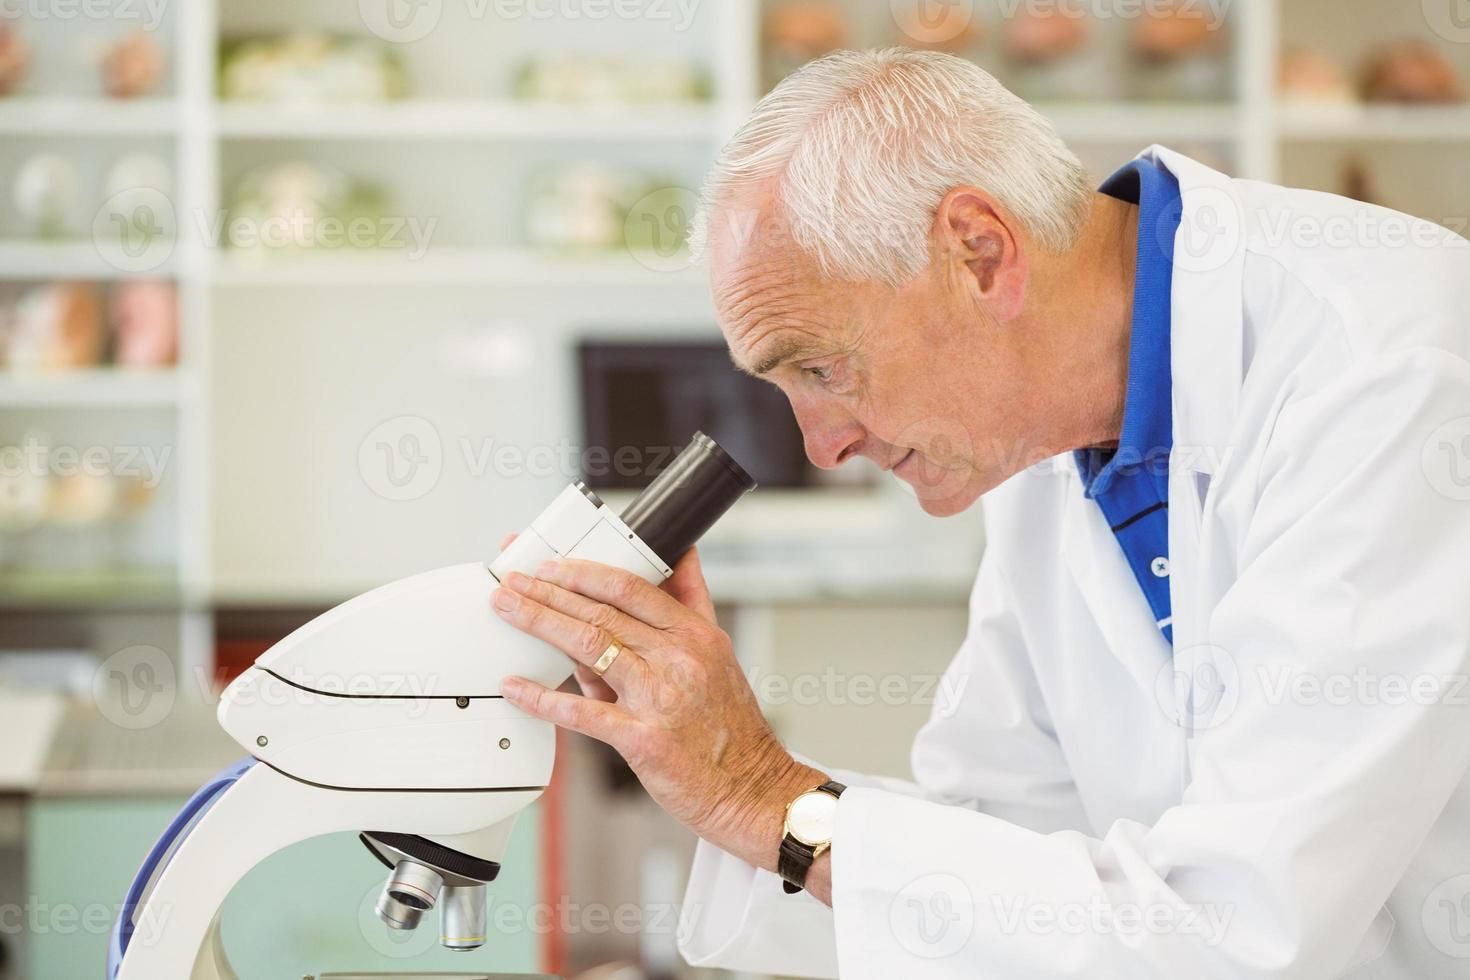 cientista sênior, olhando através do microscópio foto